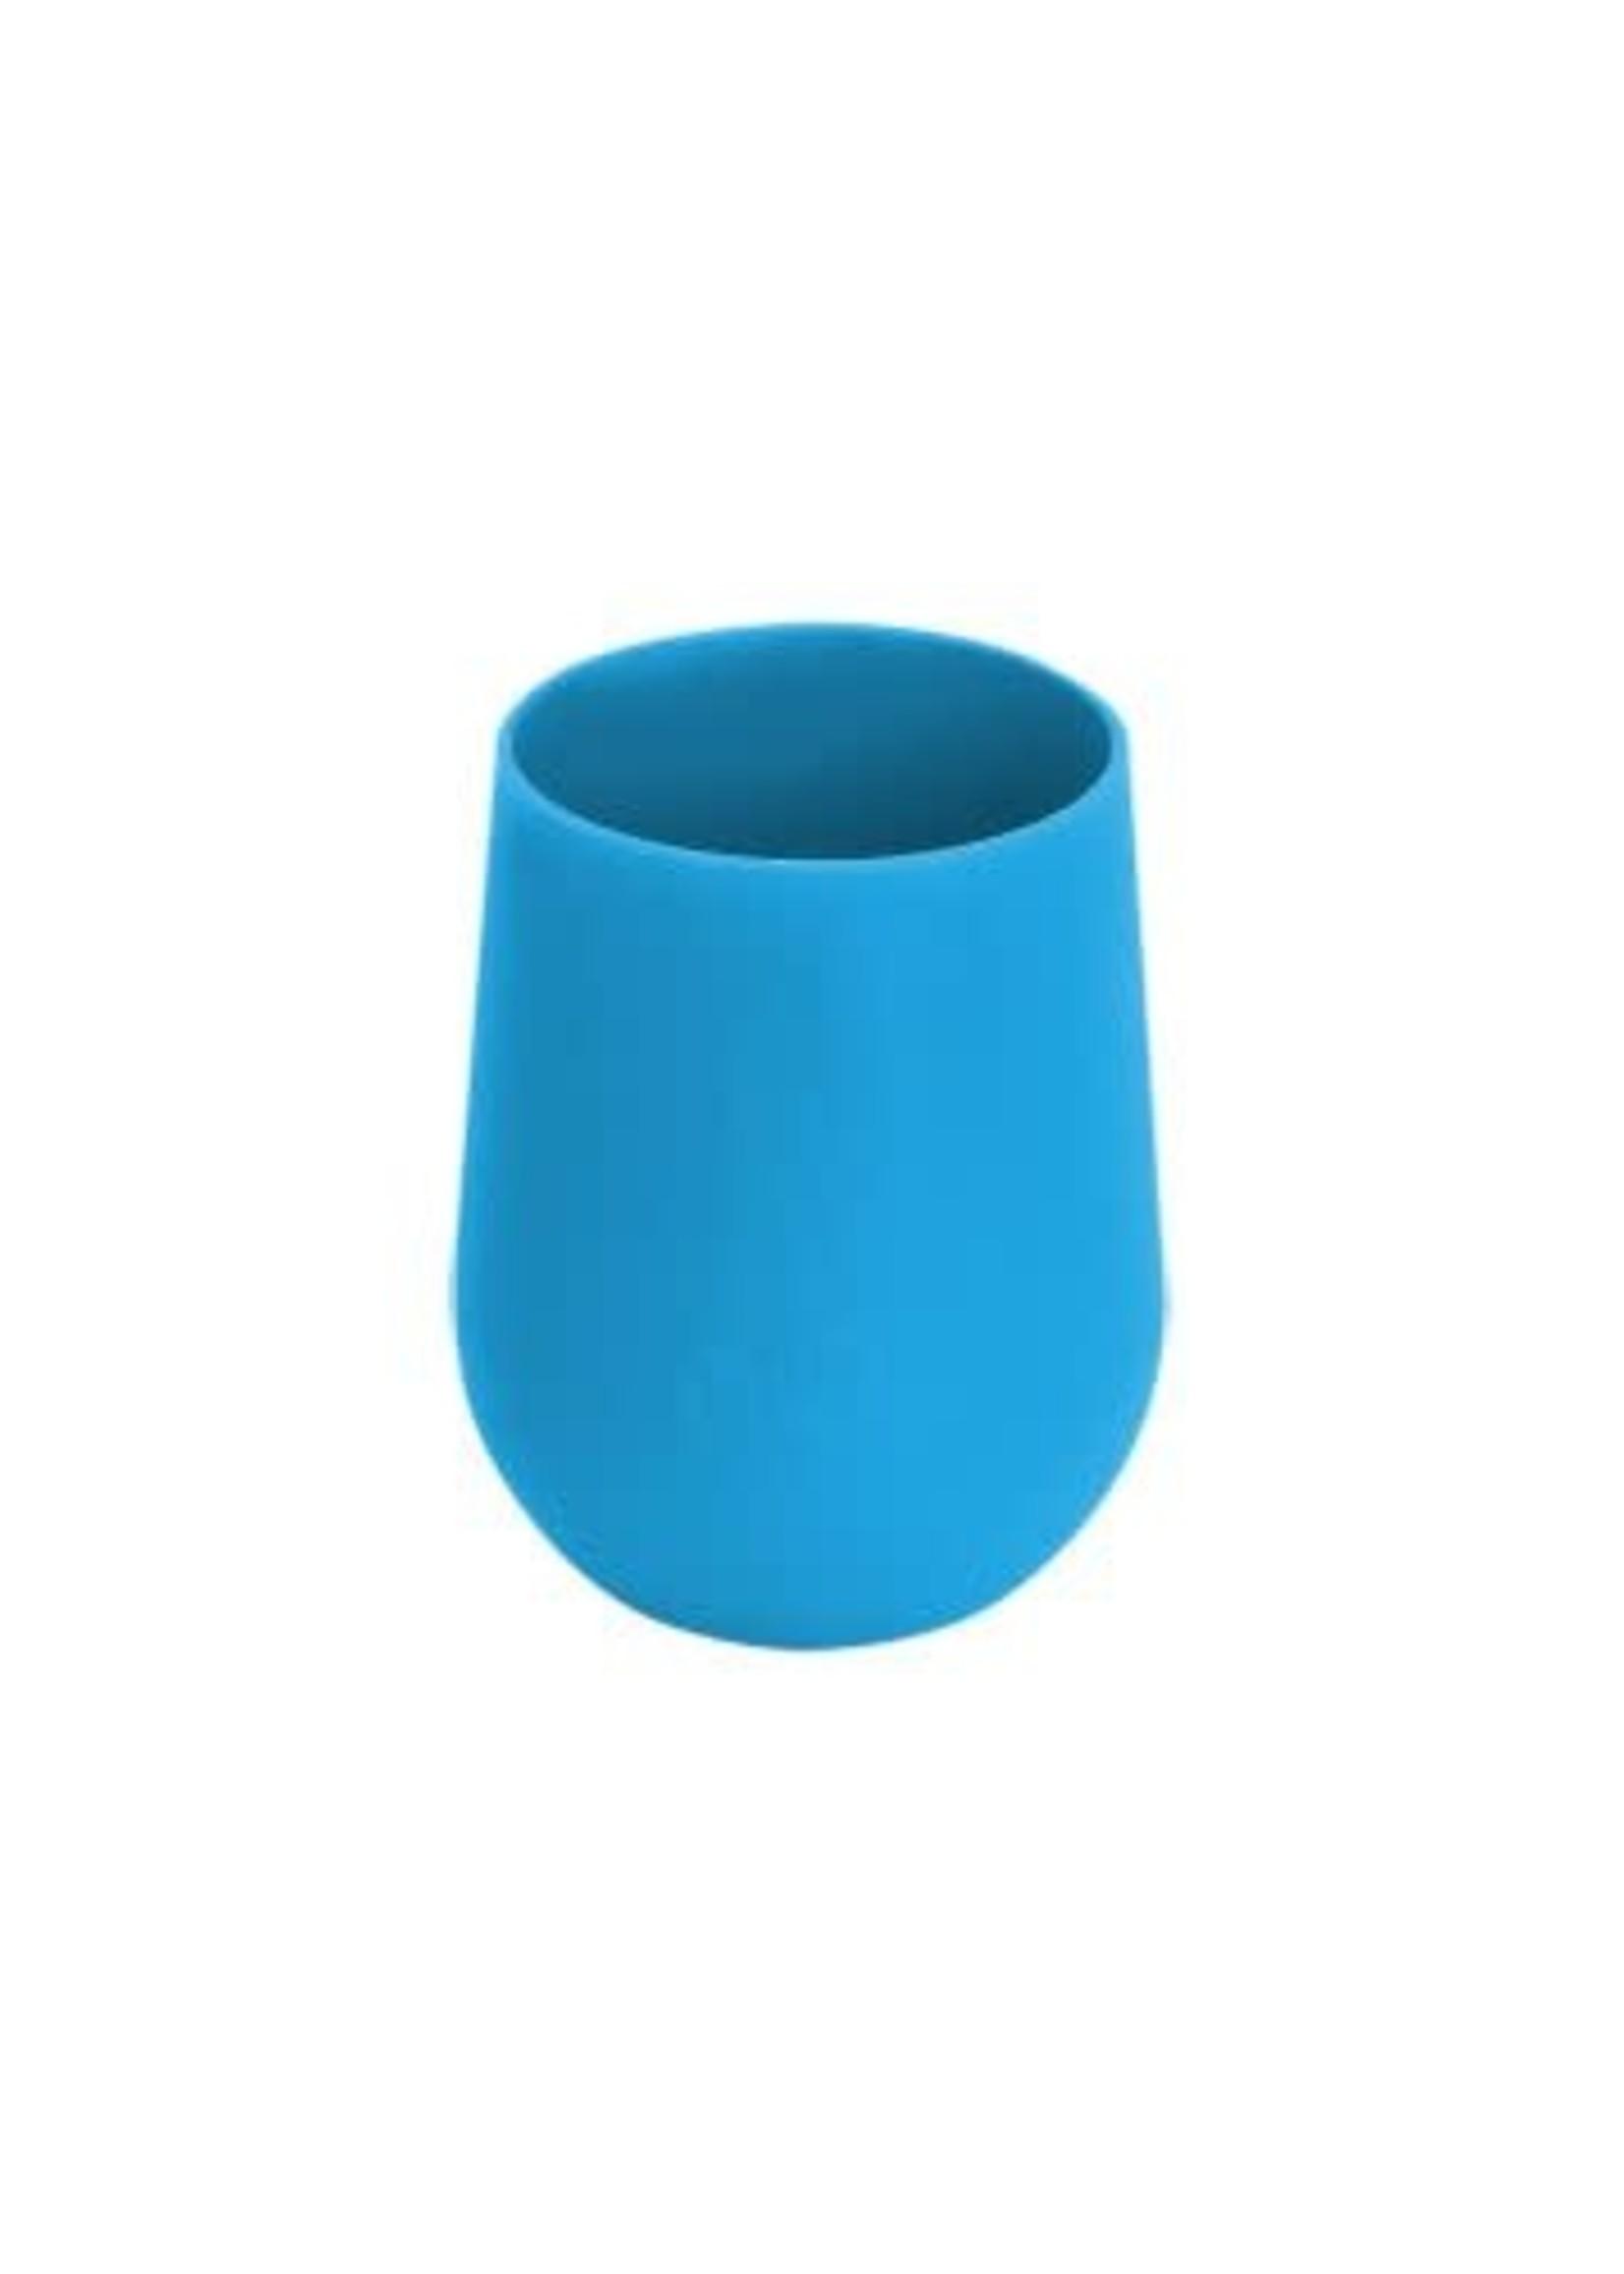 EZPZ ezpz Mini Cup (Blue)